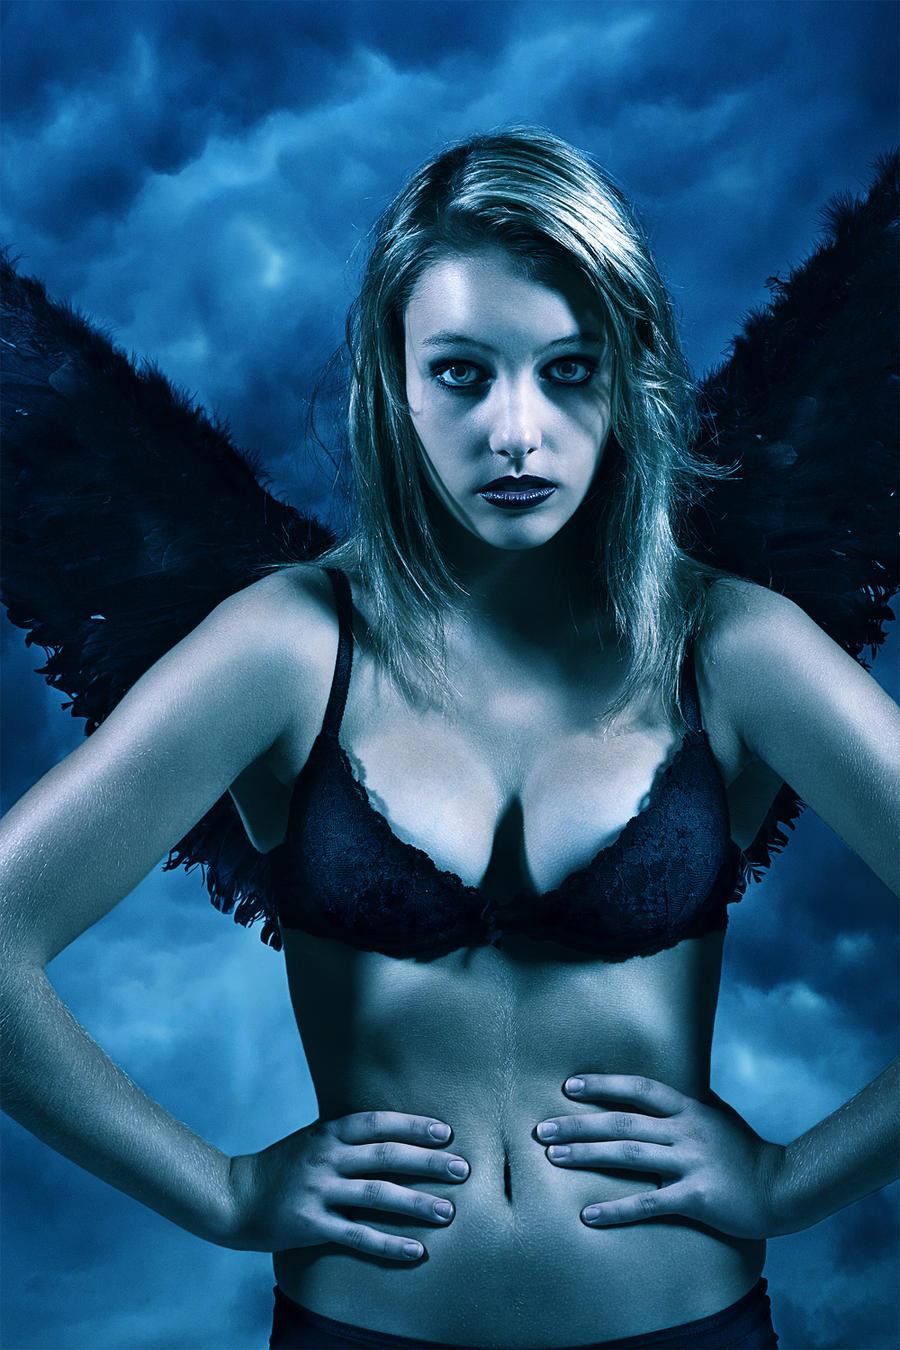 Angel by plain71